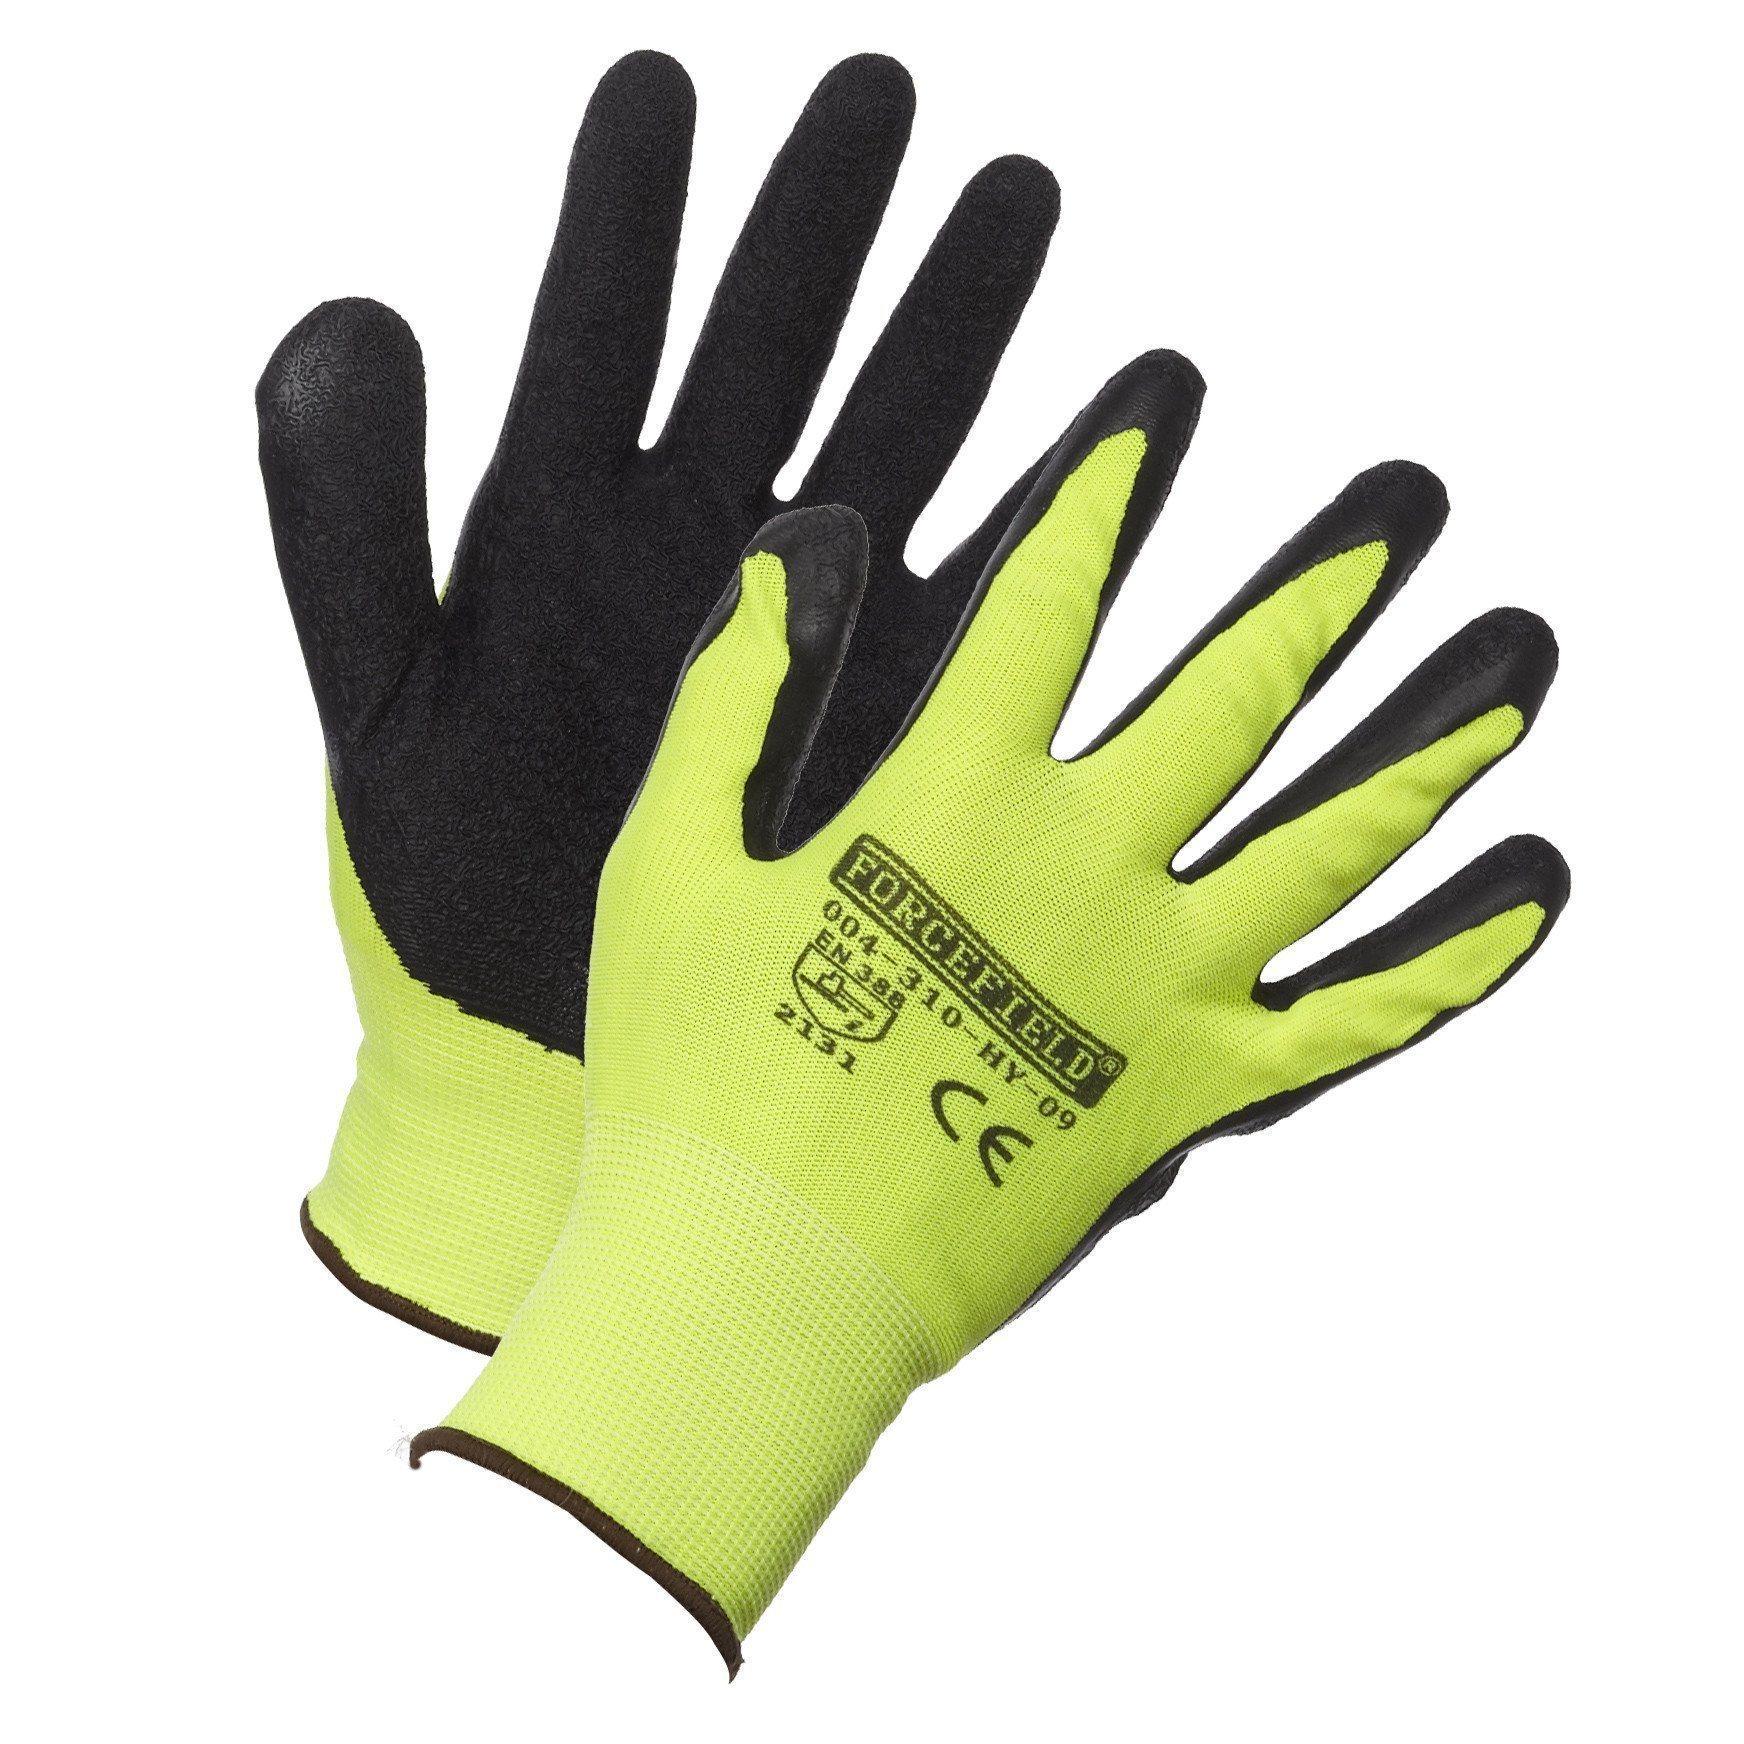 Gloves - Forcefield Hi-Vis Nylon Work Glove, Palm Coated w/Crinkle Latex - YL - S